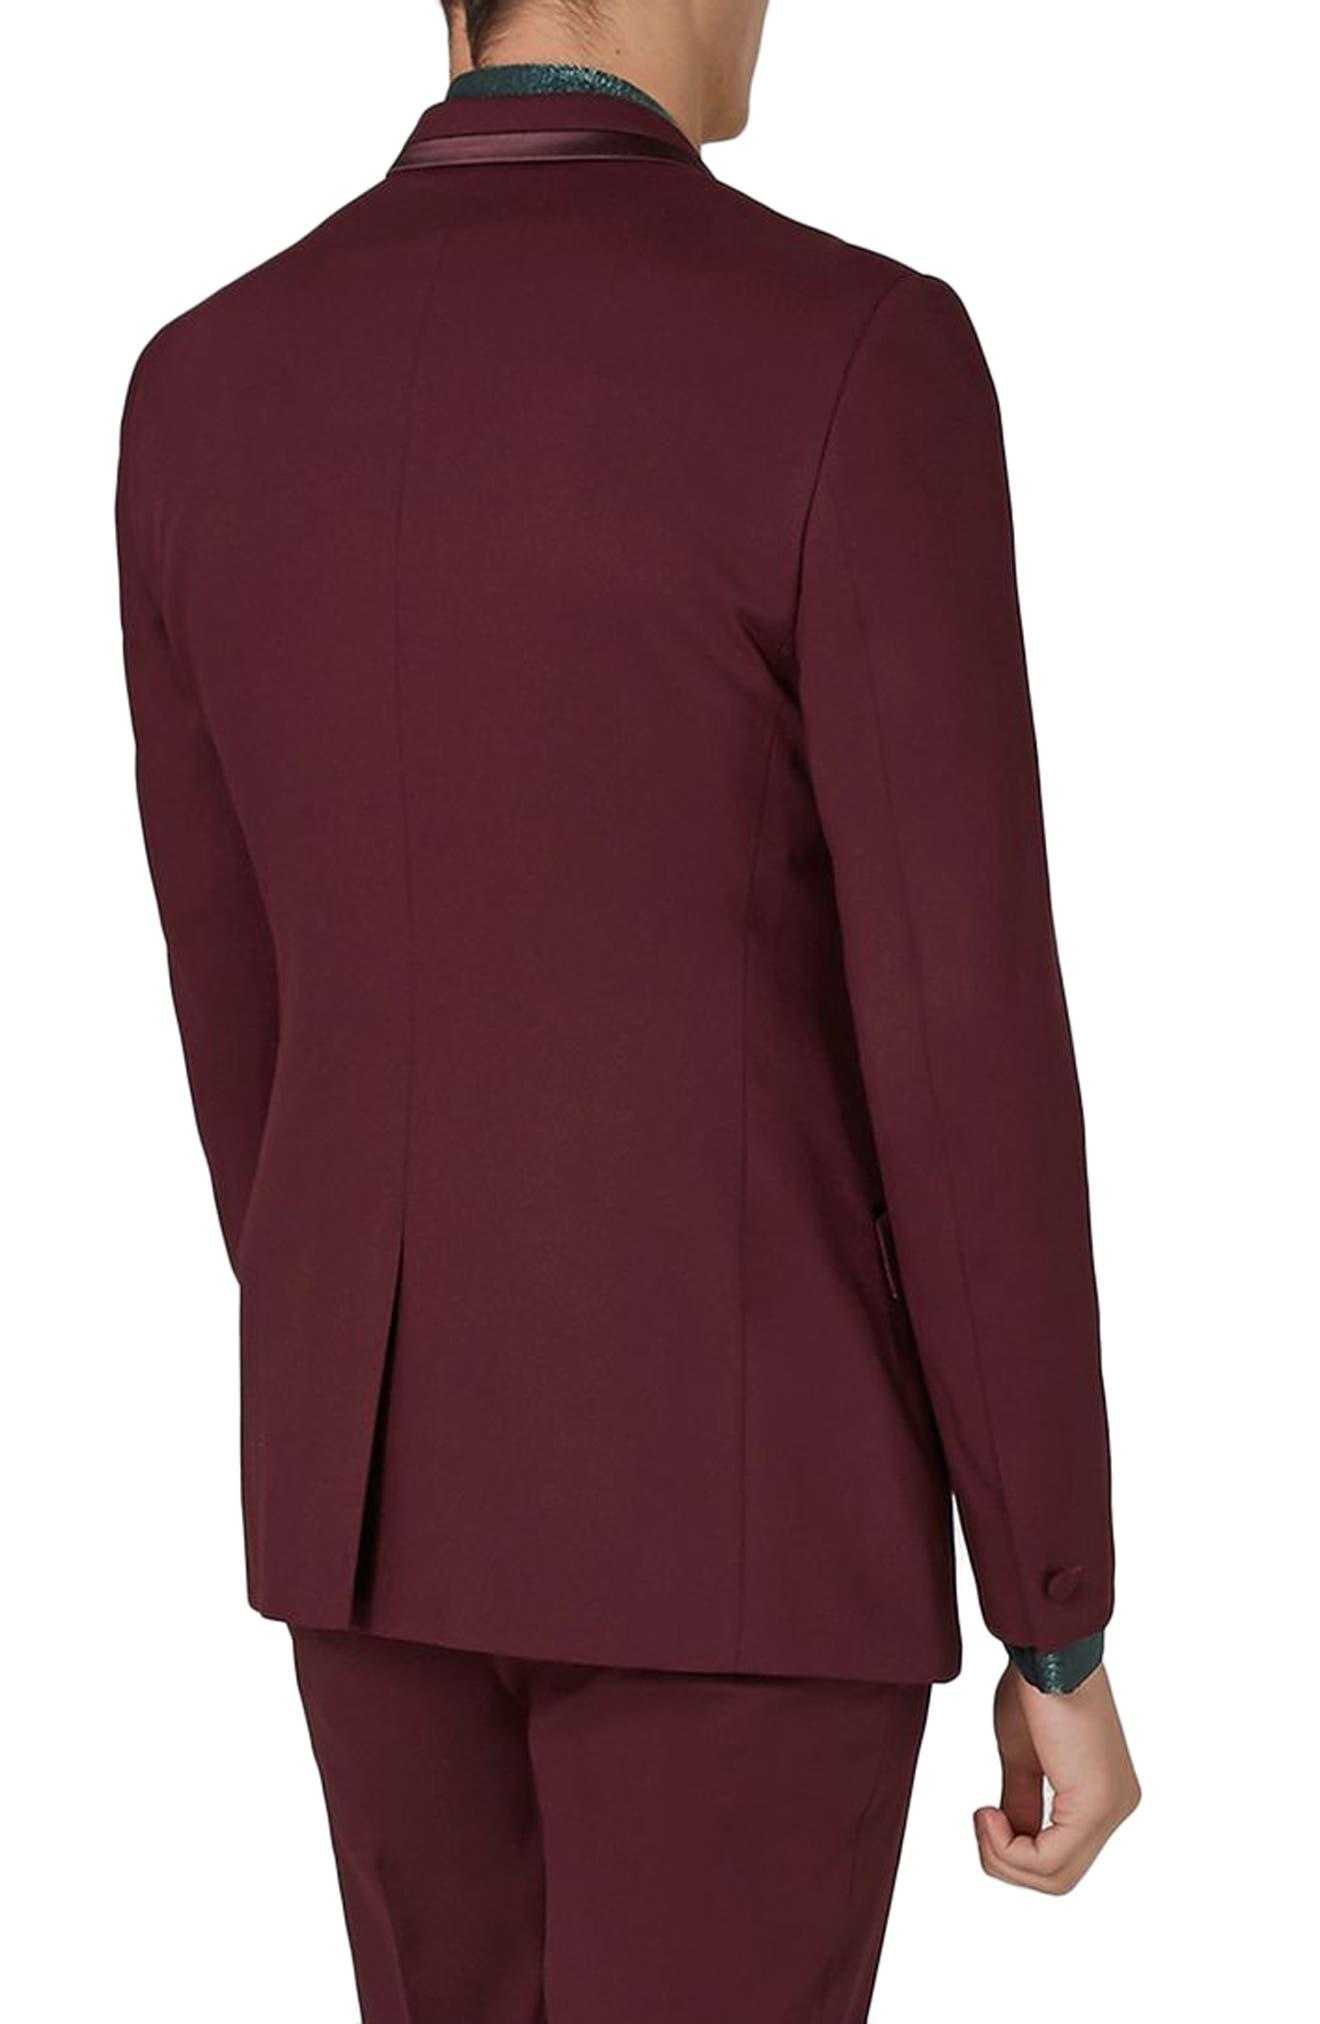 Alternate Image 3  - Topman Skinny Fit Burgundy Tuxedo Jacket